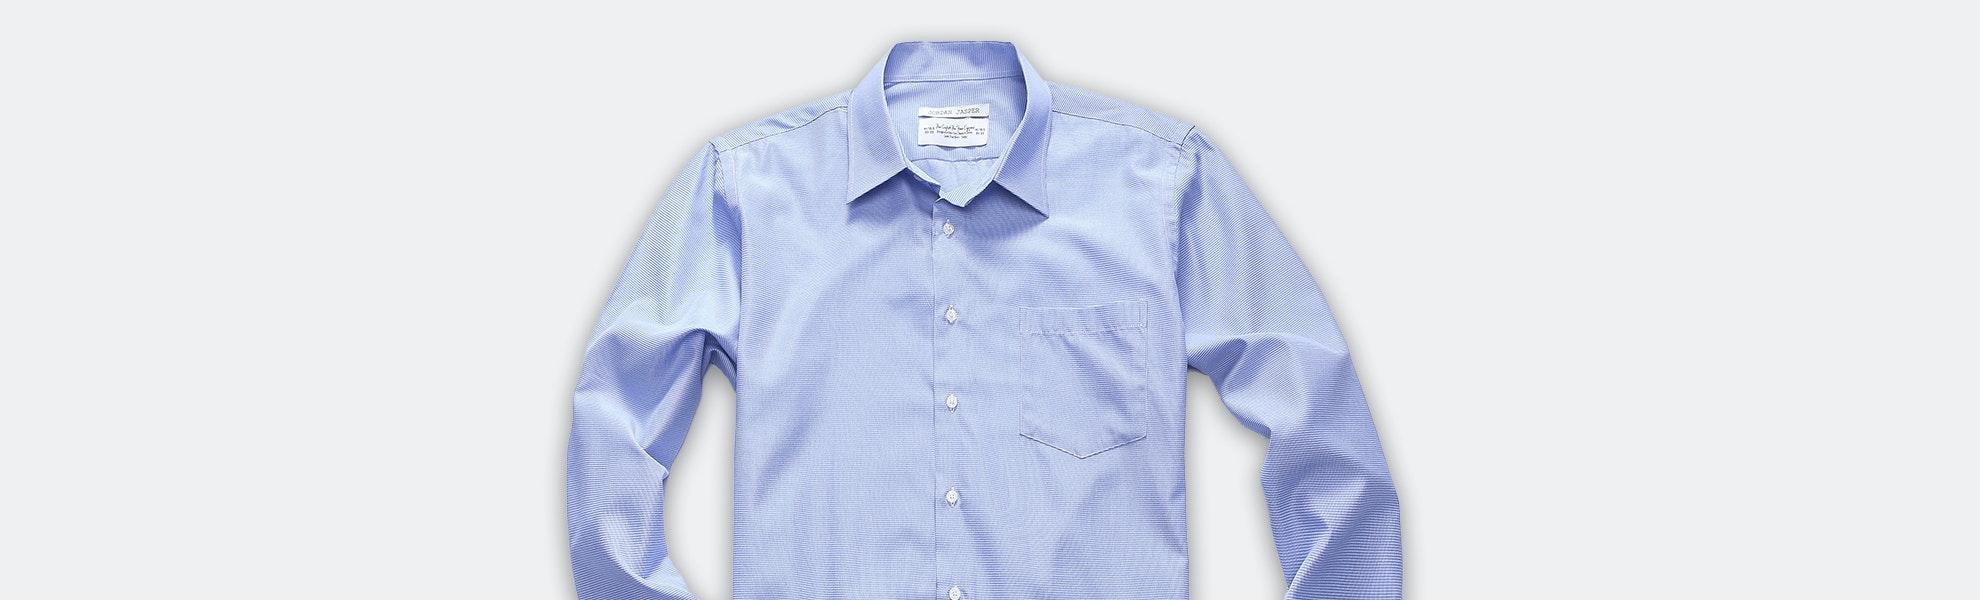 Jordan Jasper Woven Shirts